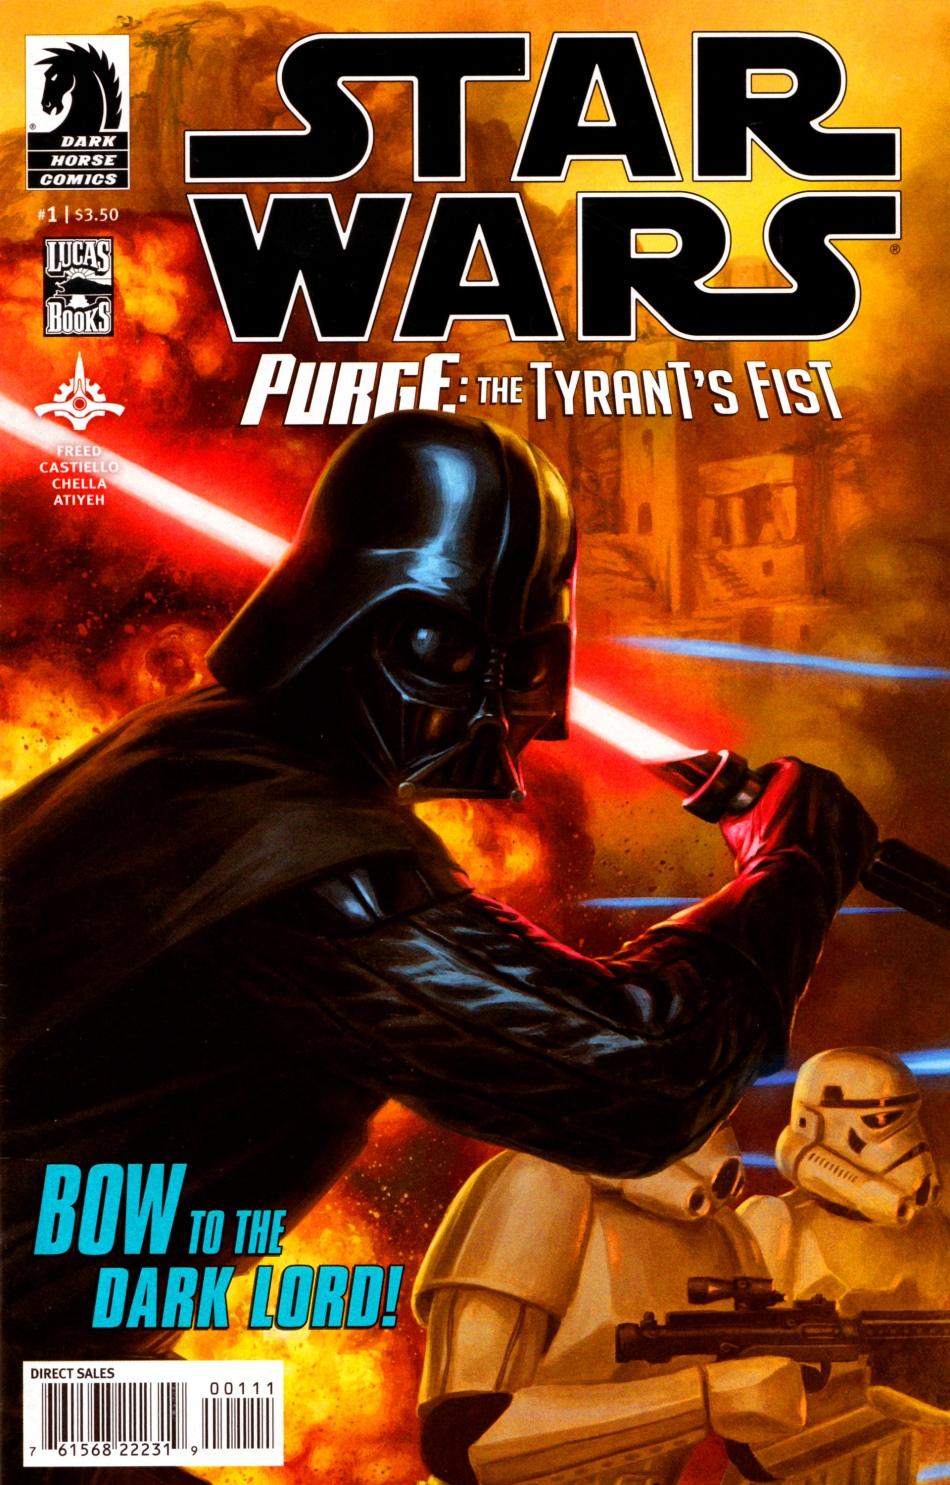 Purge: The Tyrant's Fist #1 (05.12.2012)